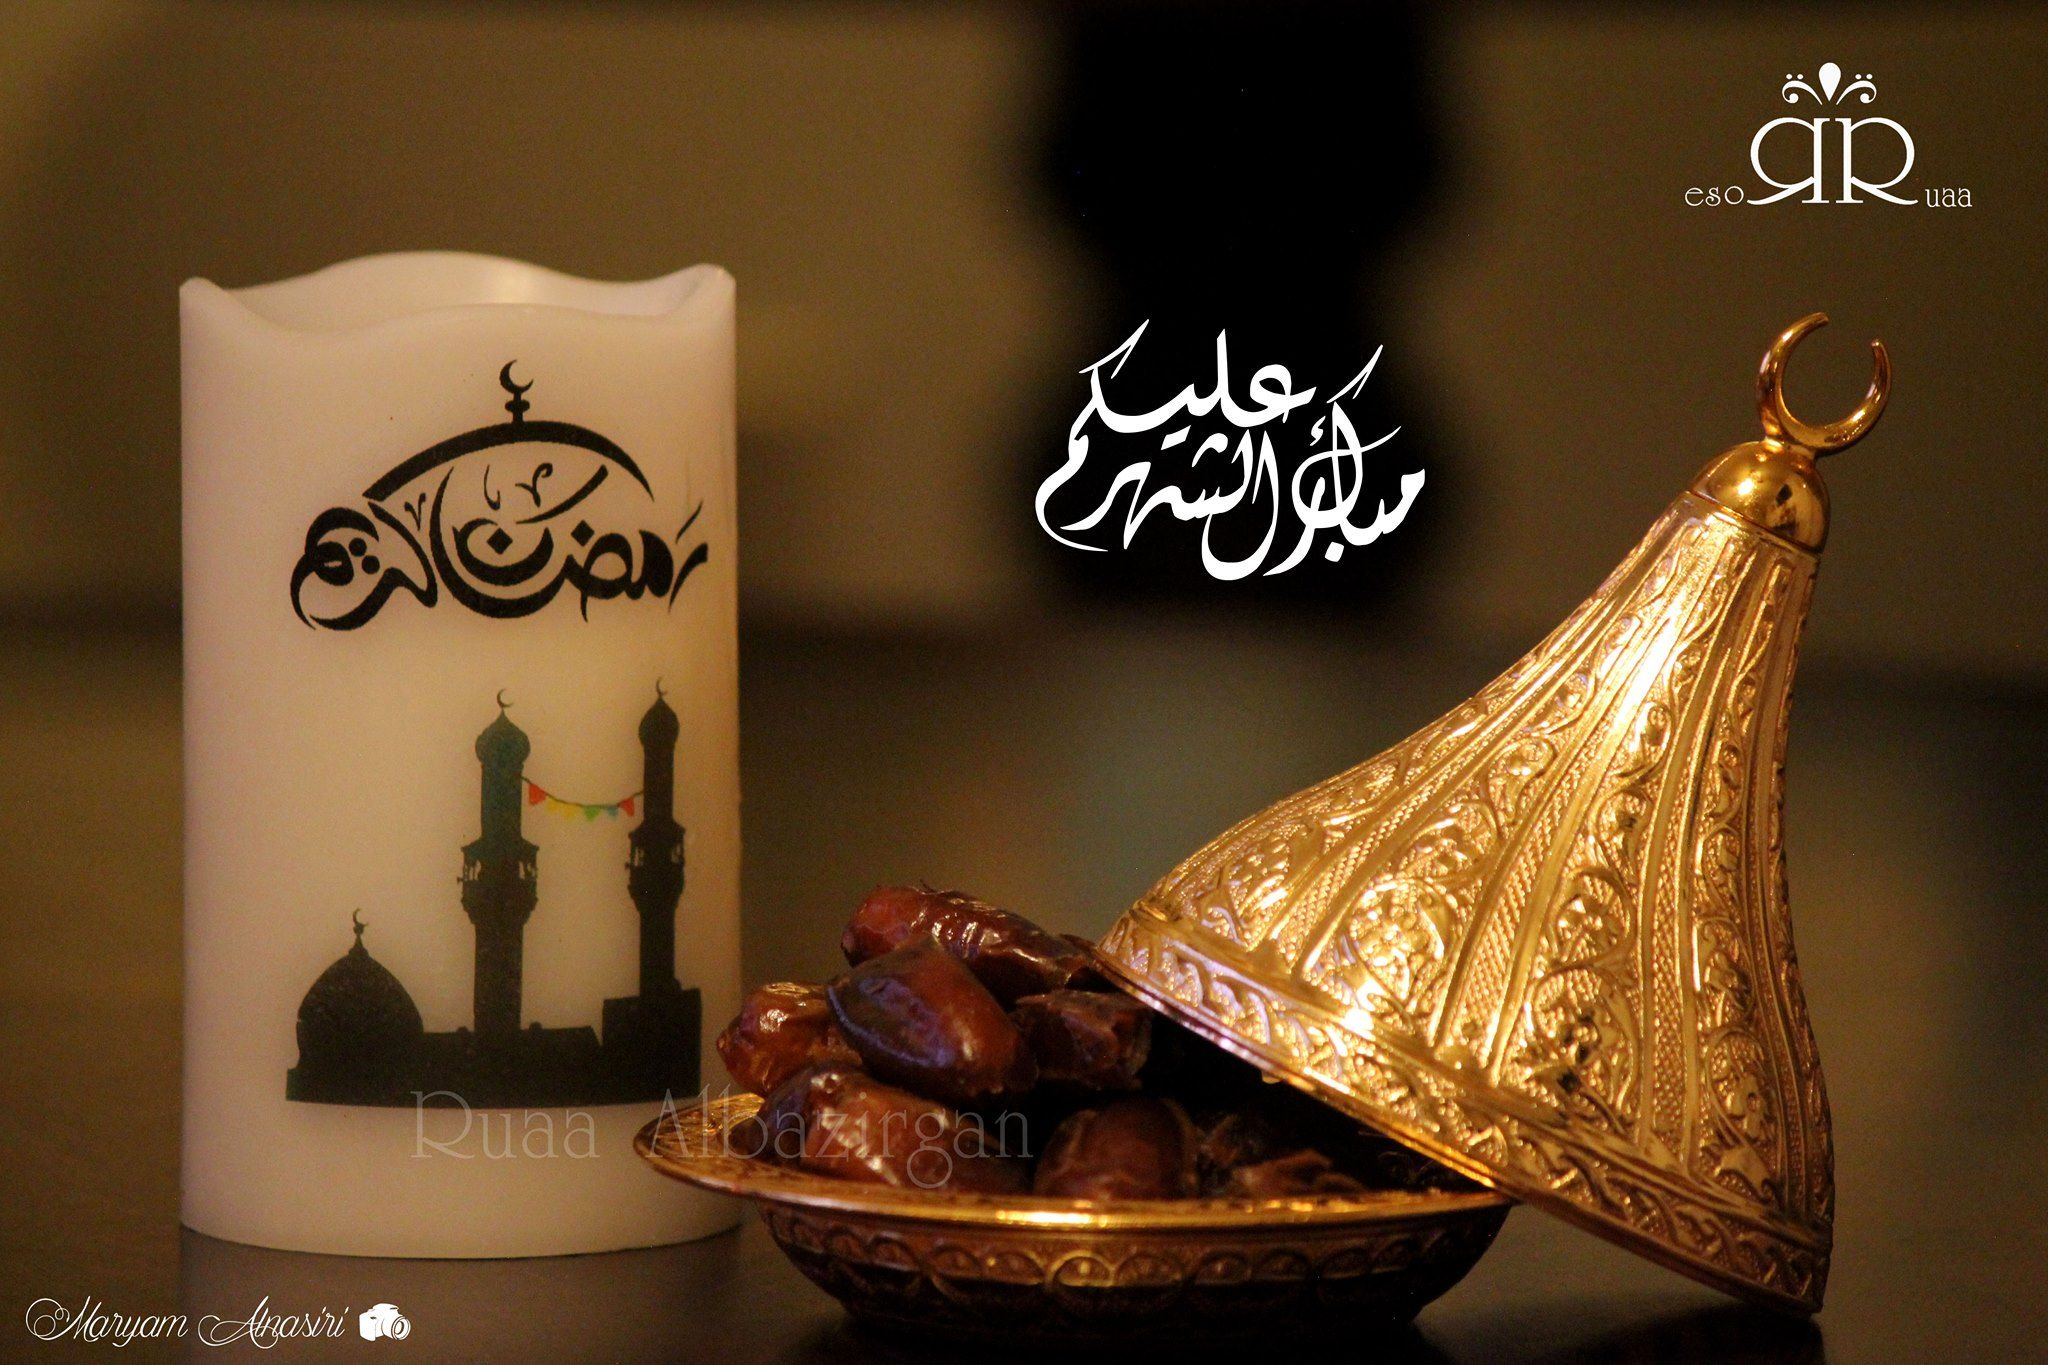 Ramadan By Ruaa Rose رمضان كريم Ramadan Printable Art Candles